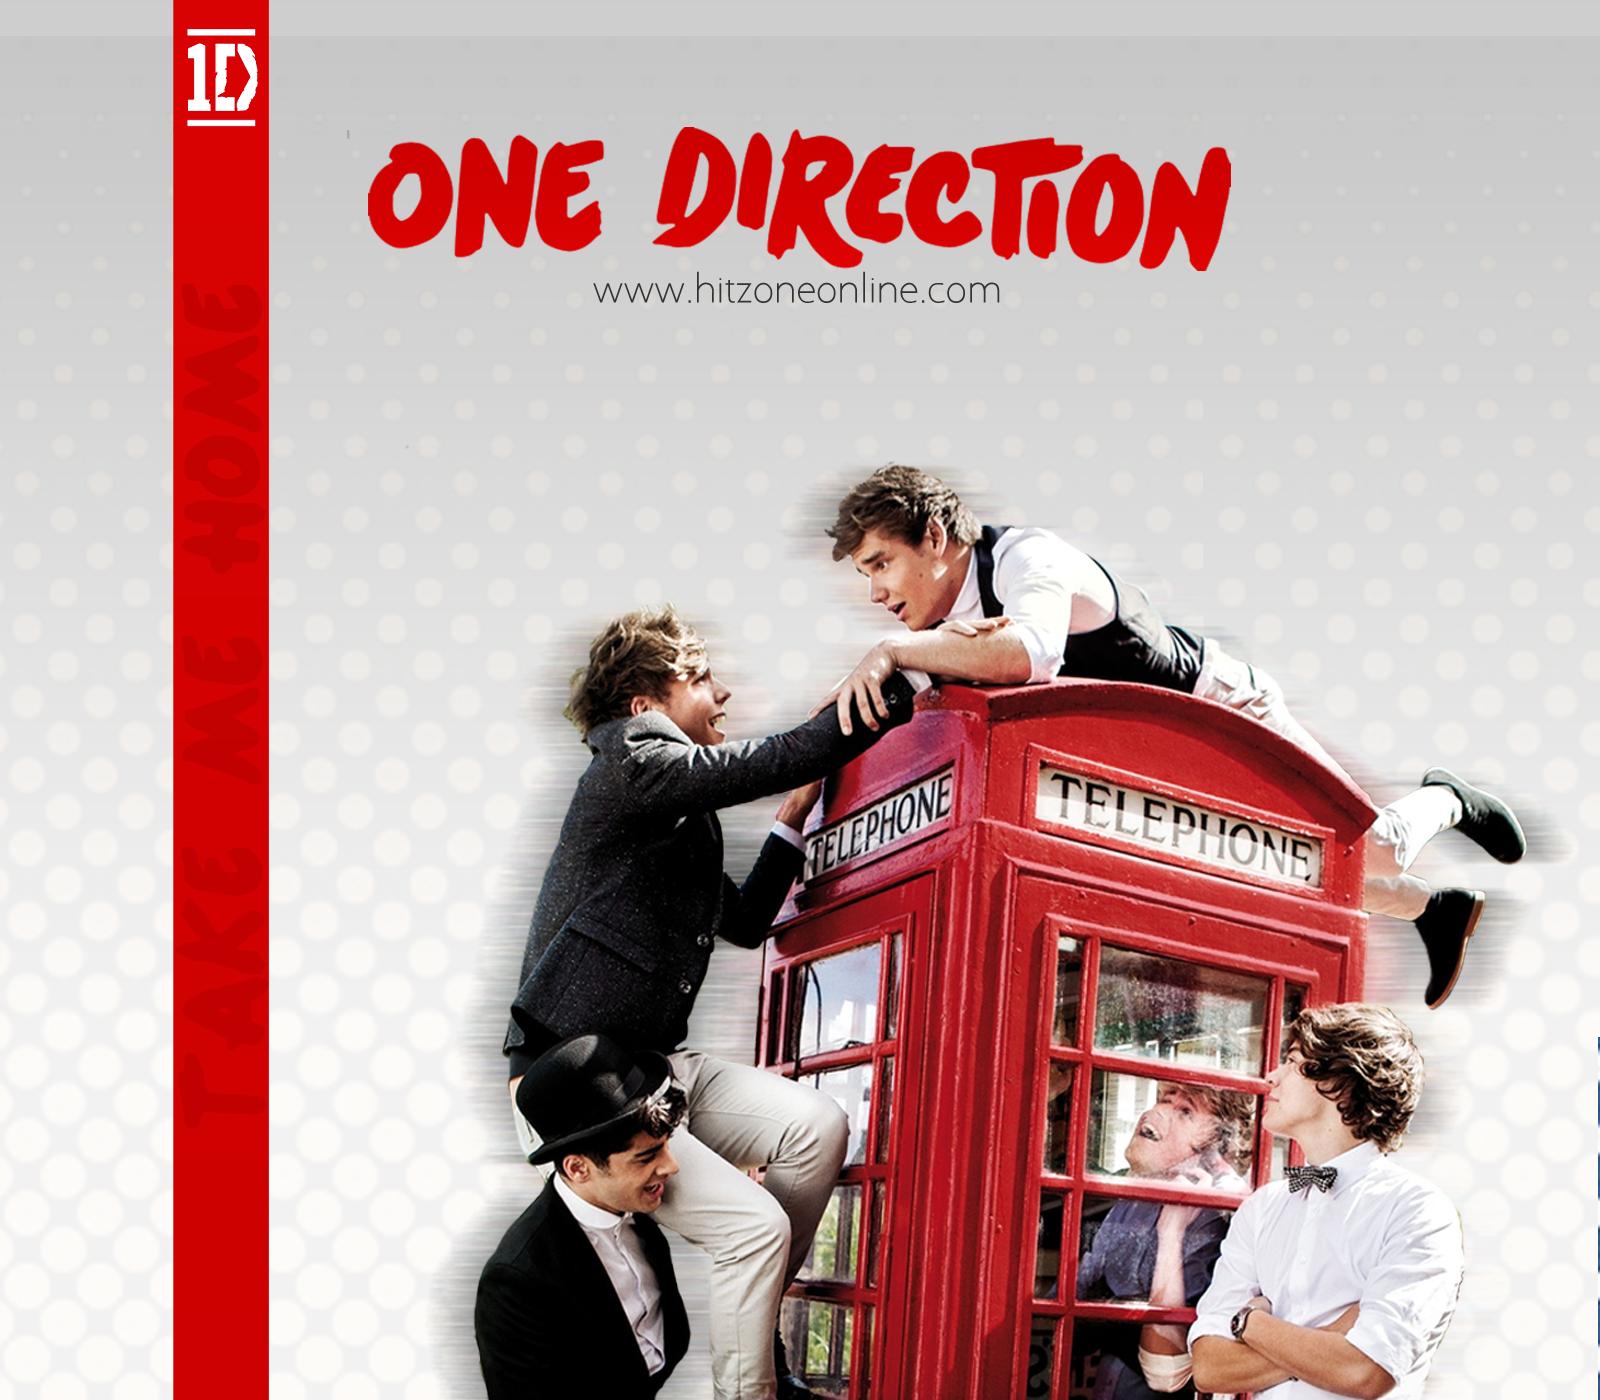 [77+] One Direction Take Me Home Wallpaper on WallpaperSafari